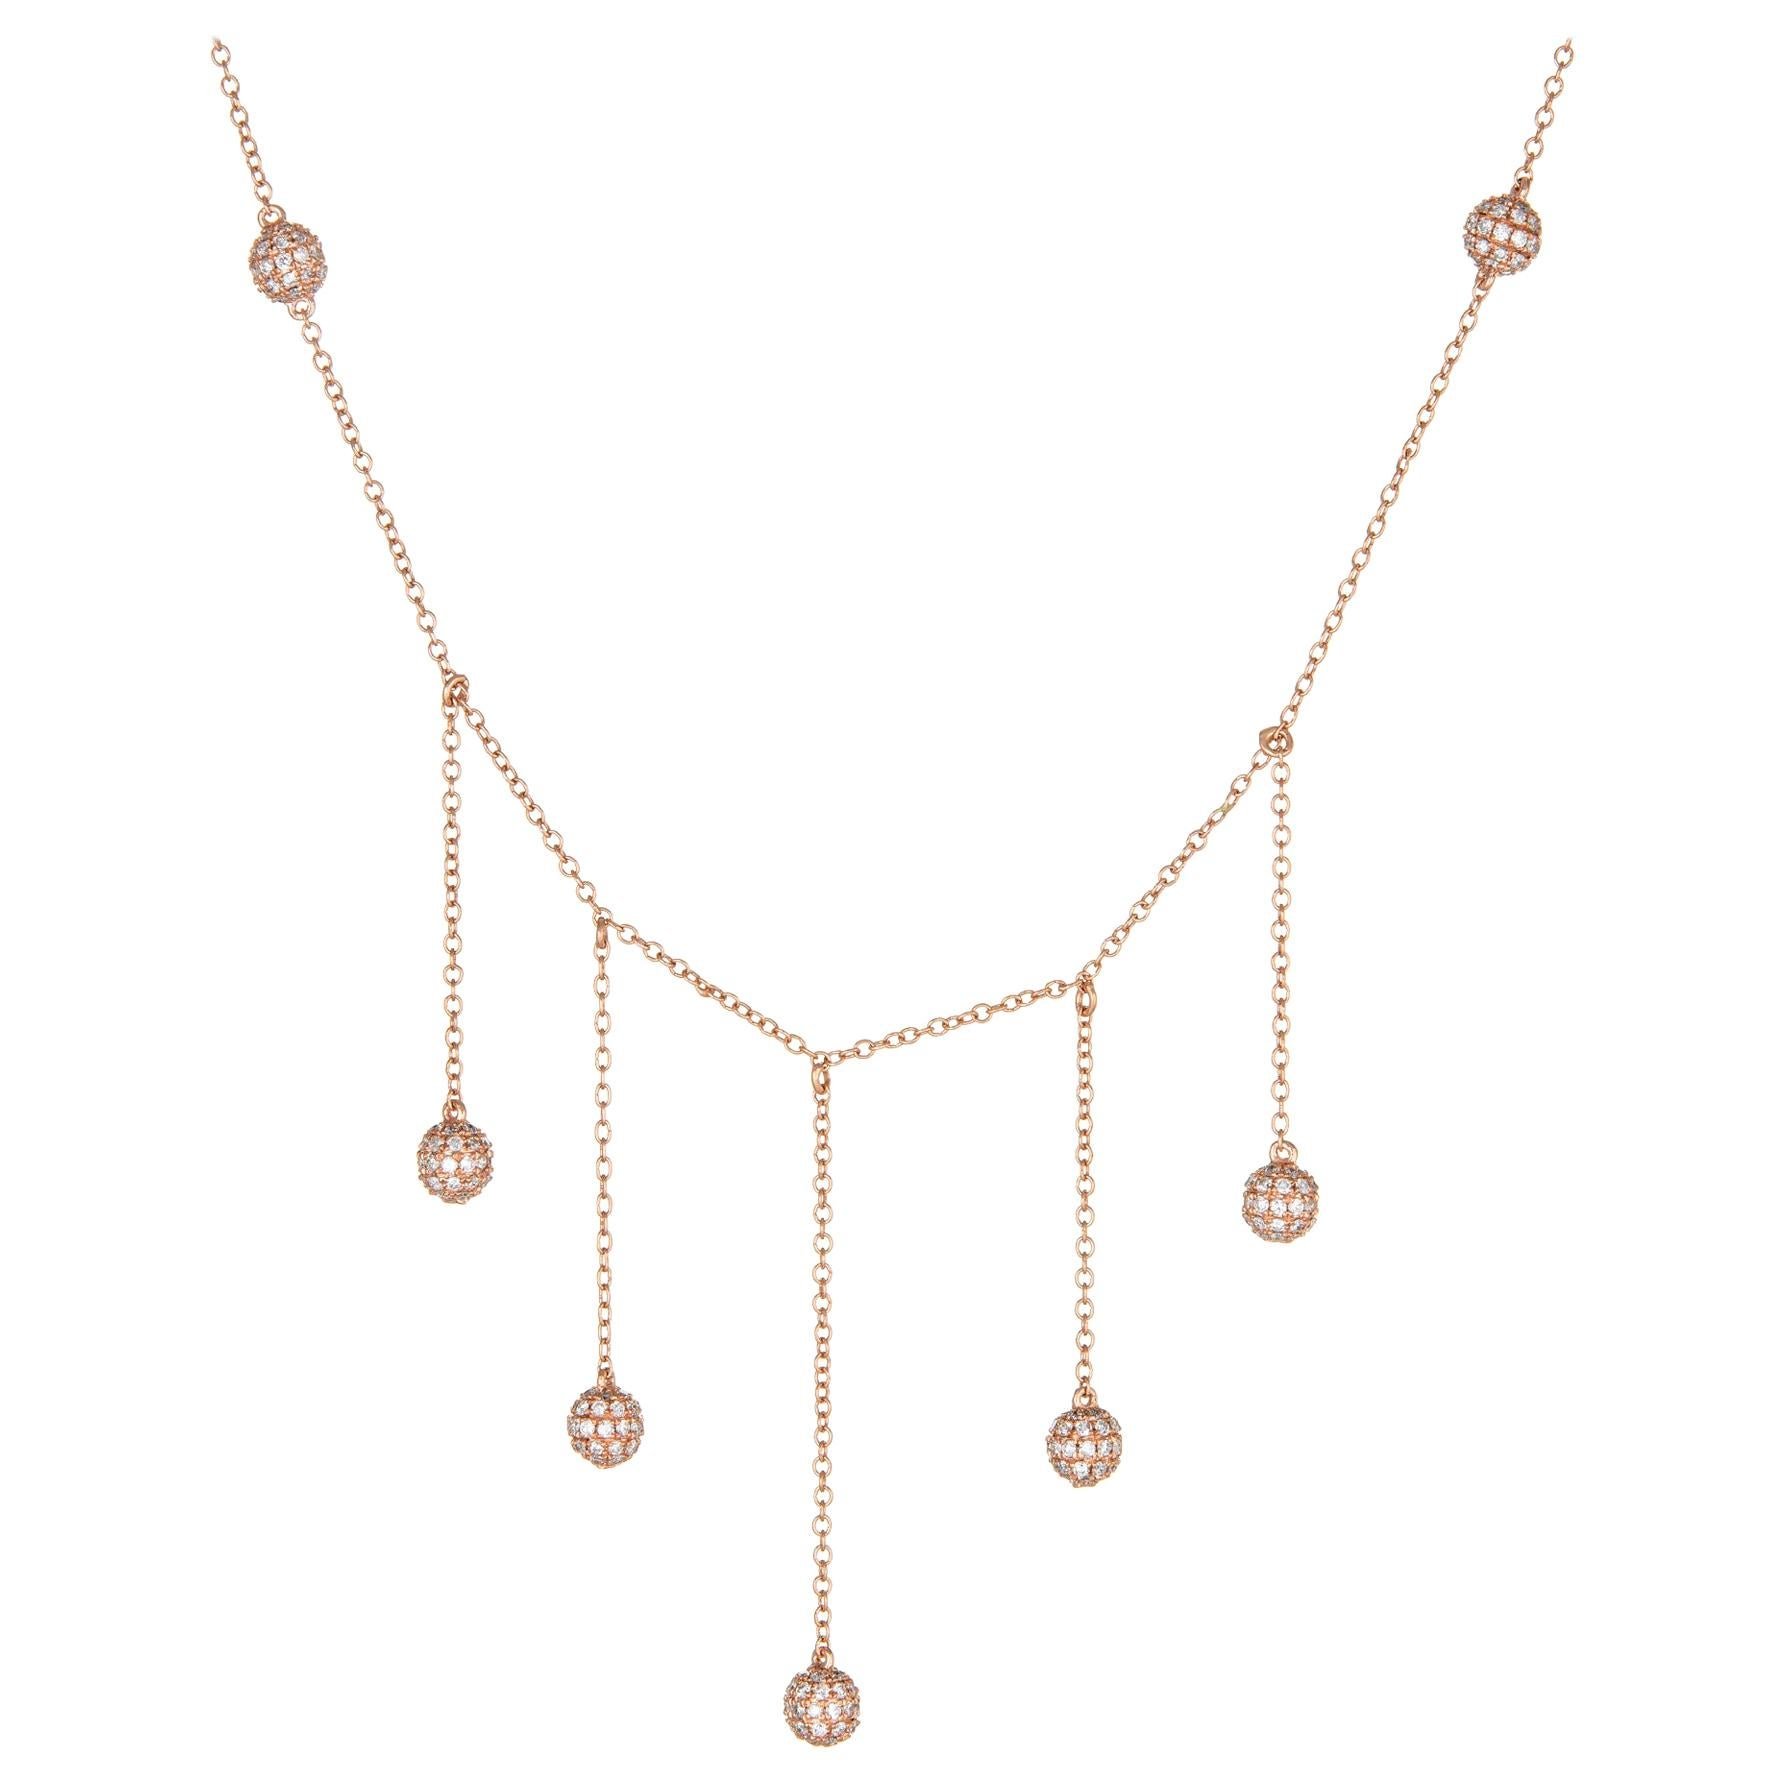 1.20 Carat Diamond Necklace 14 Karat Rose Gold Fringe Drop Pave Orbs Round Short